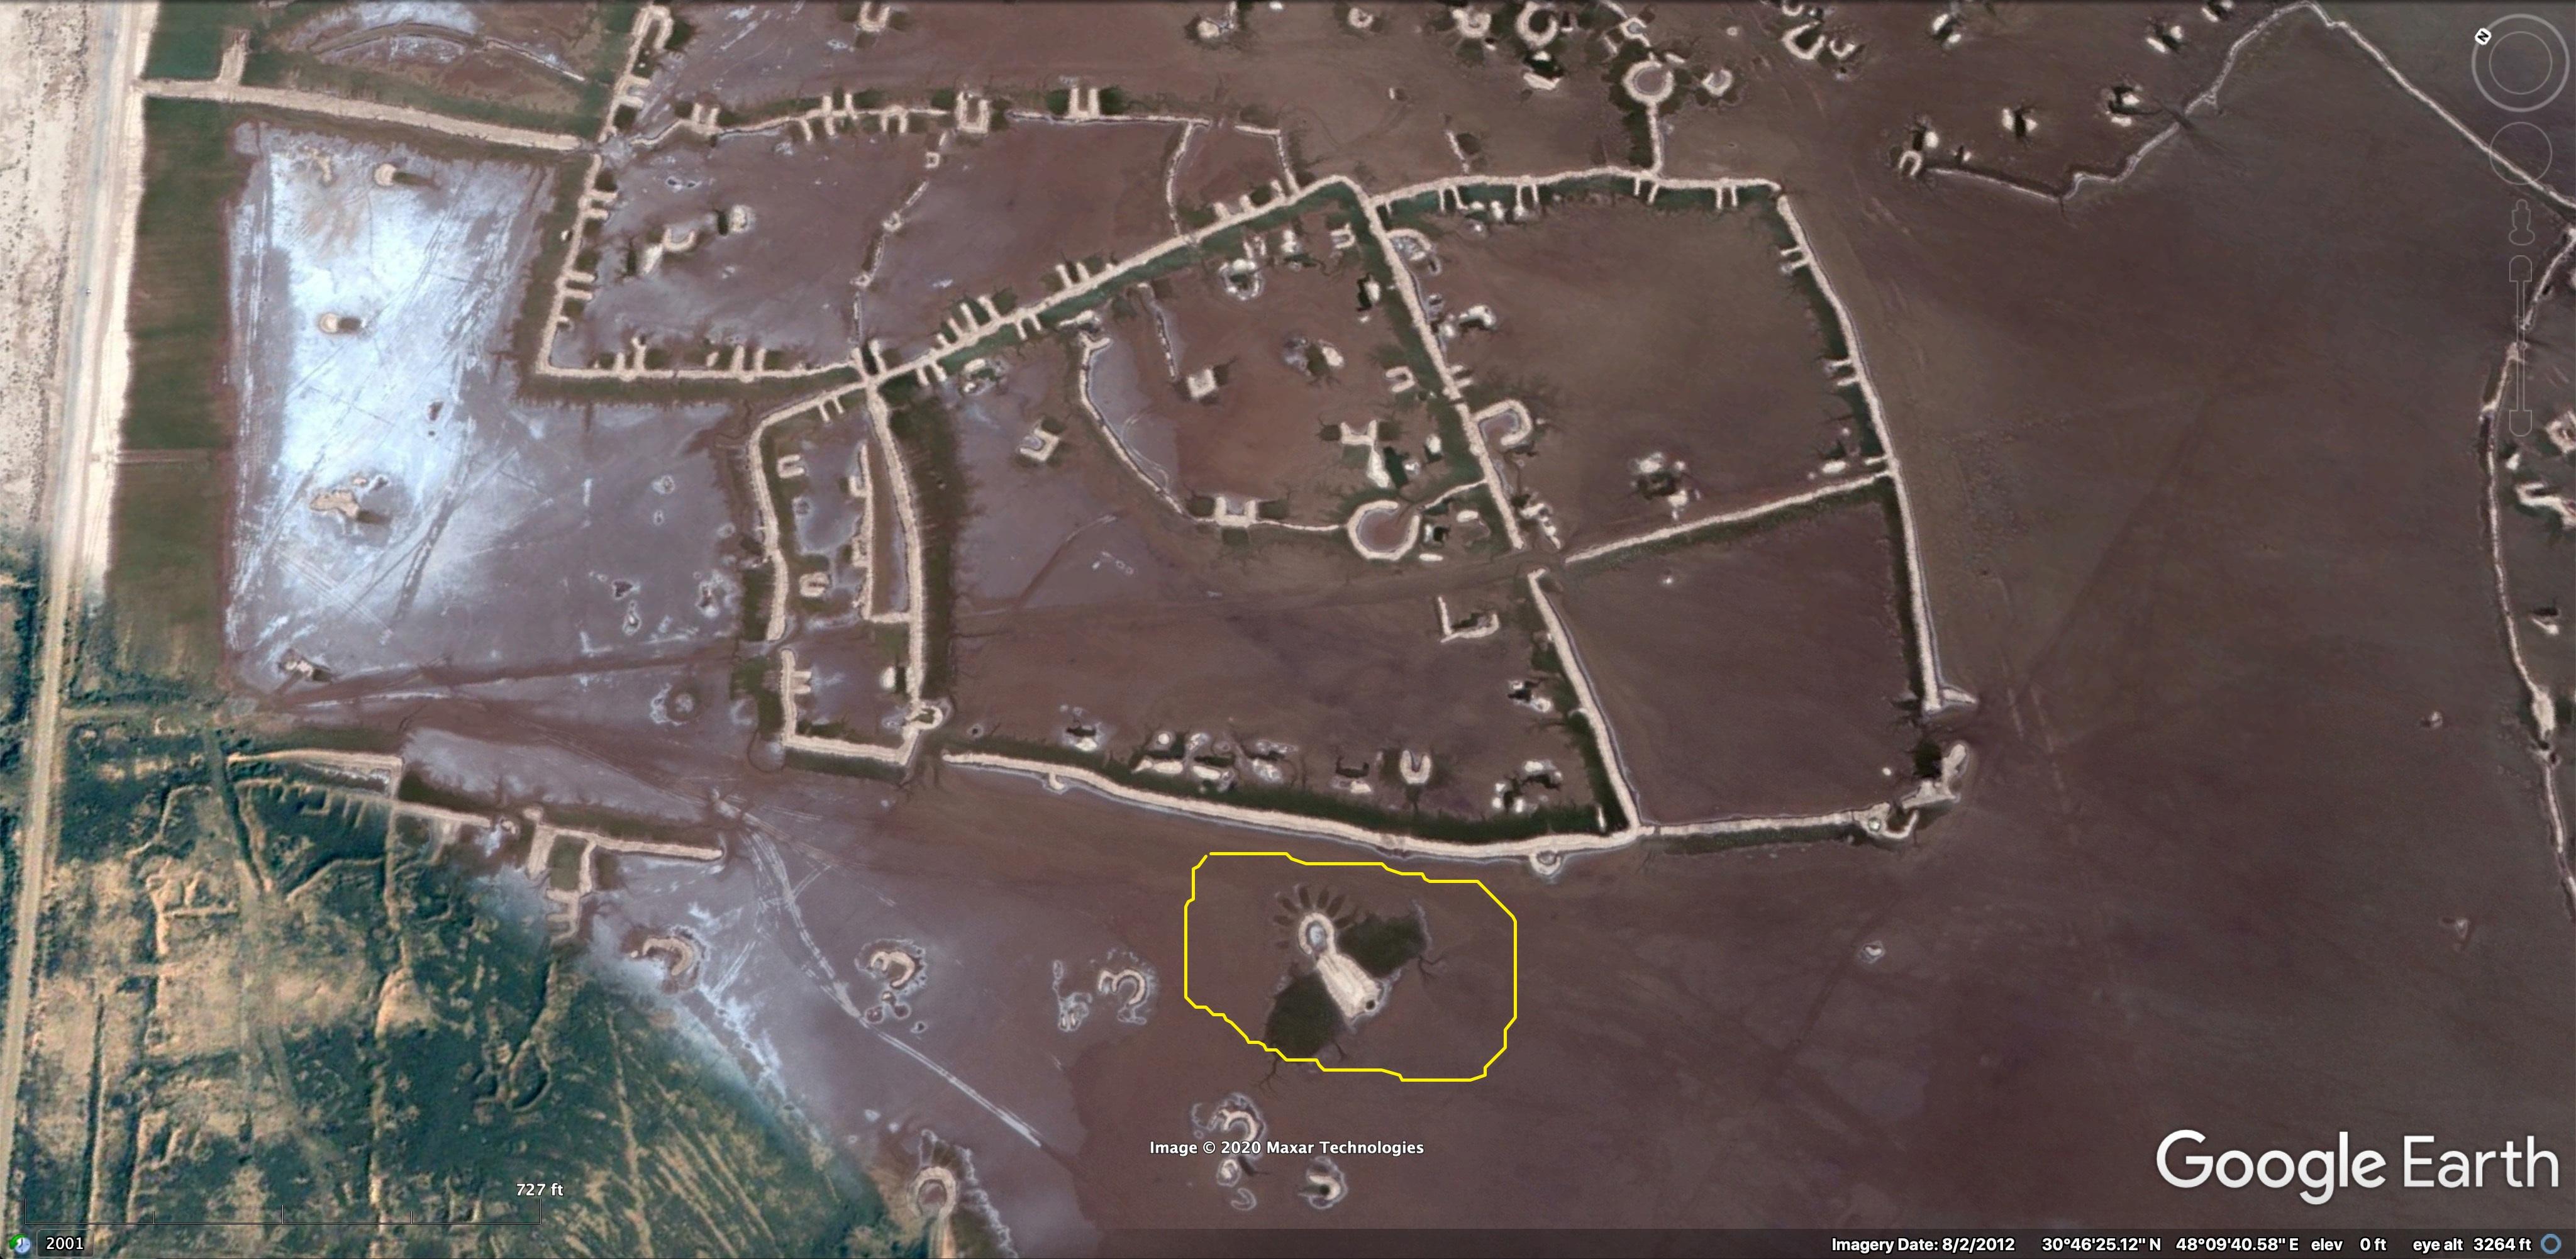 Google Earth Pro 2020-09-28 10-50-26.jpg